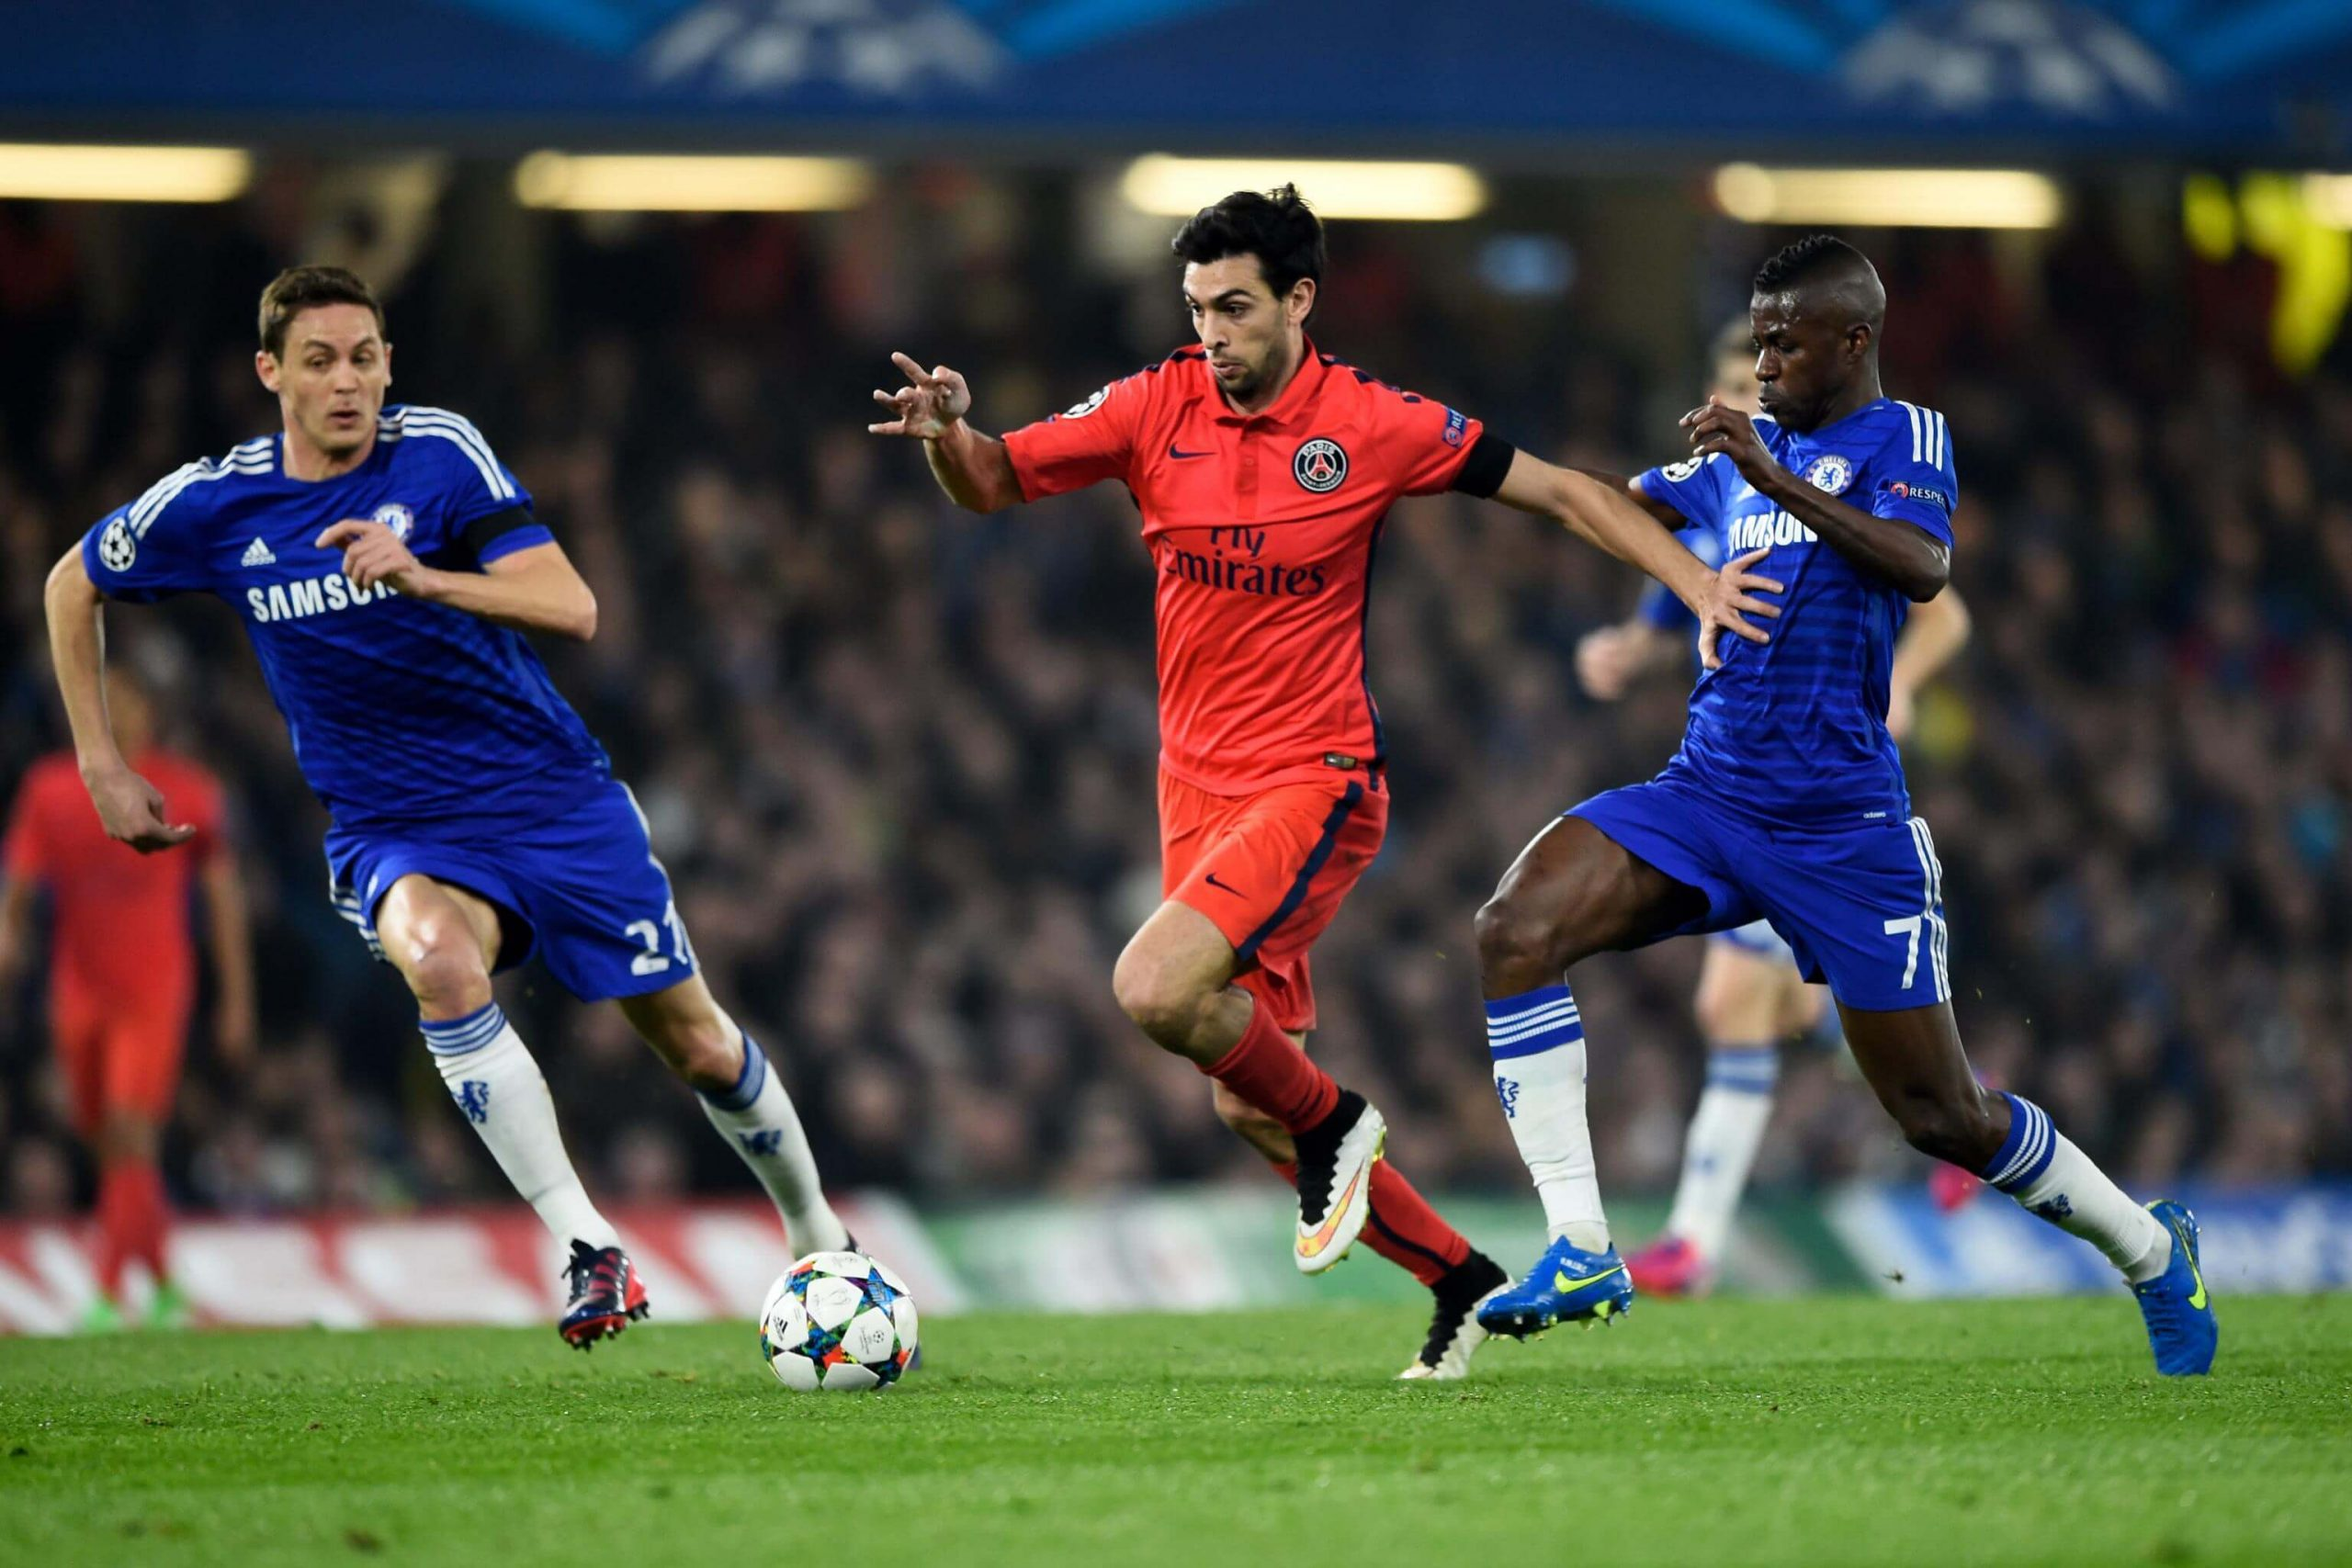 PSG takes slight advantage over Chelsea